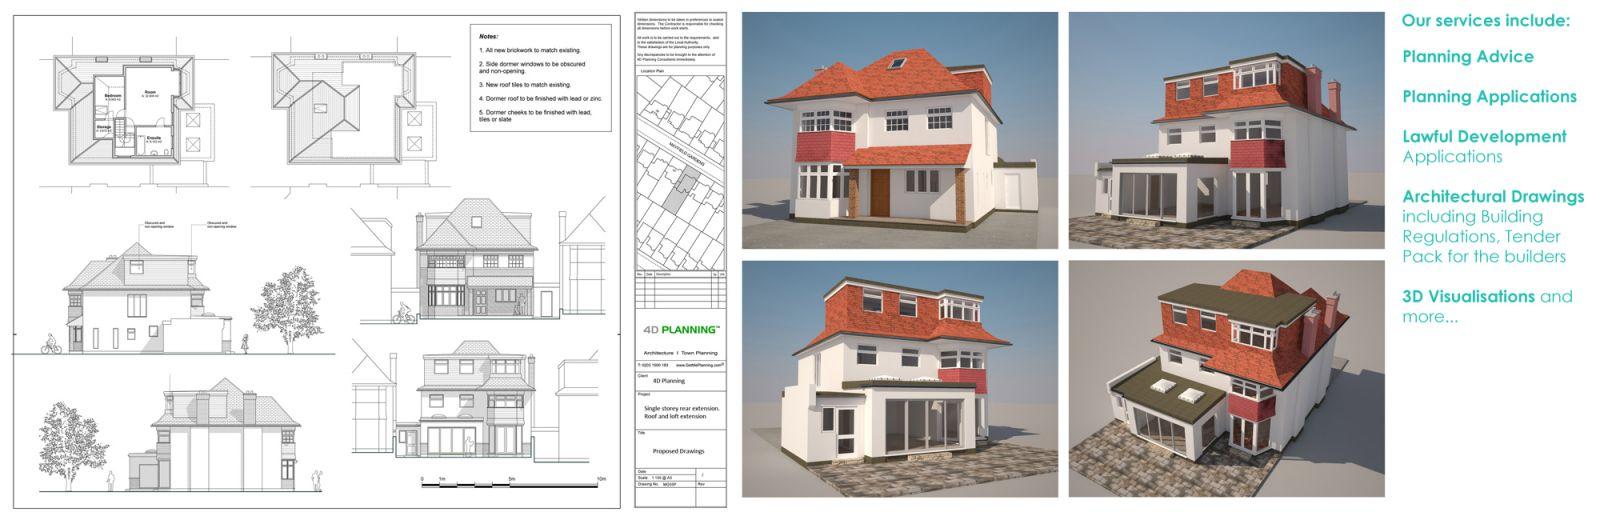 Pittrichie home farm planning application prestbury.